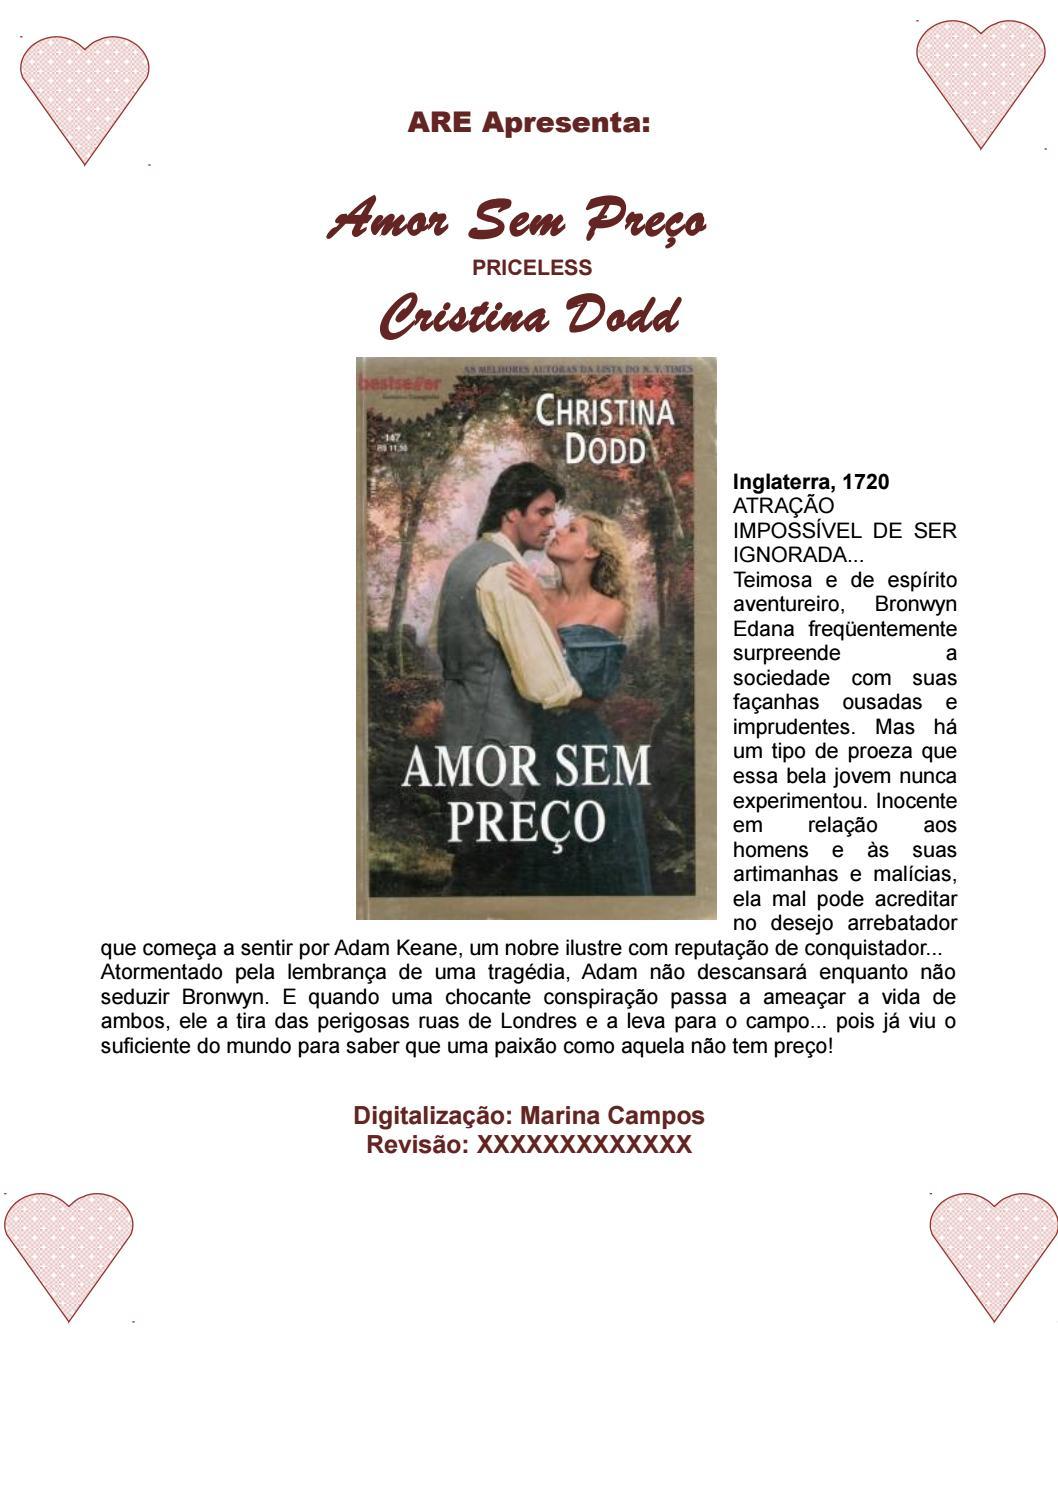 Cristinadodd amorsempreobestseller147 by Patrícia Martins Fonseca - issuu d57c12f4b63